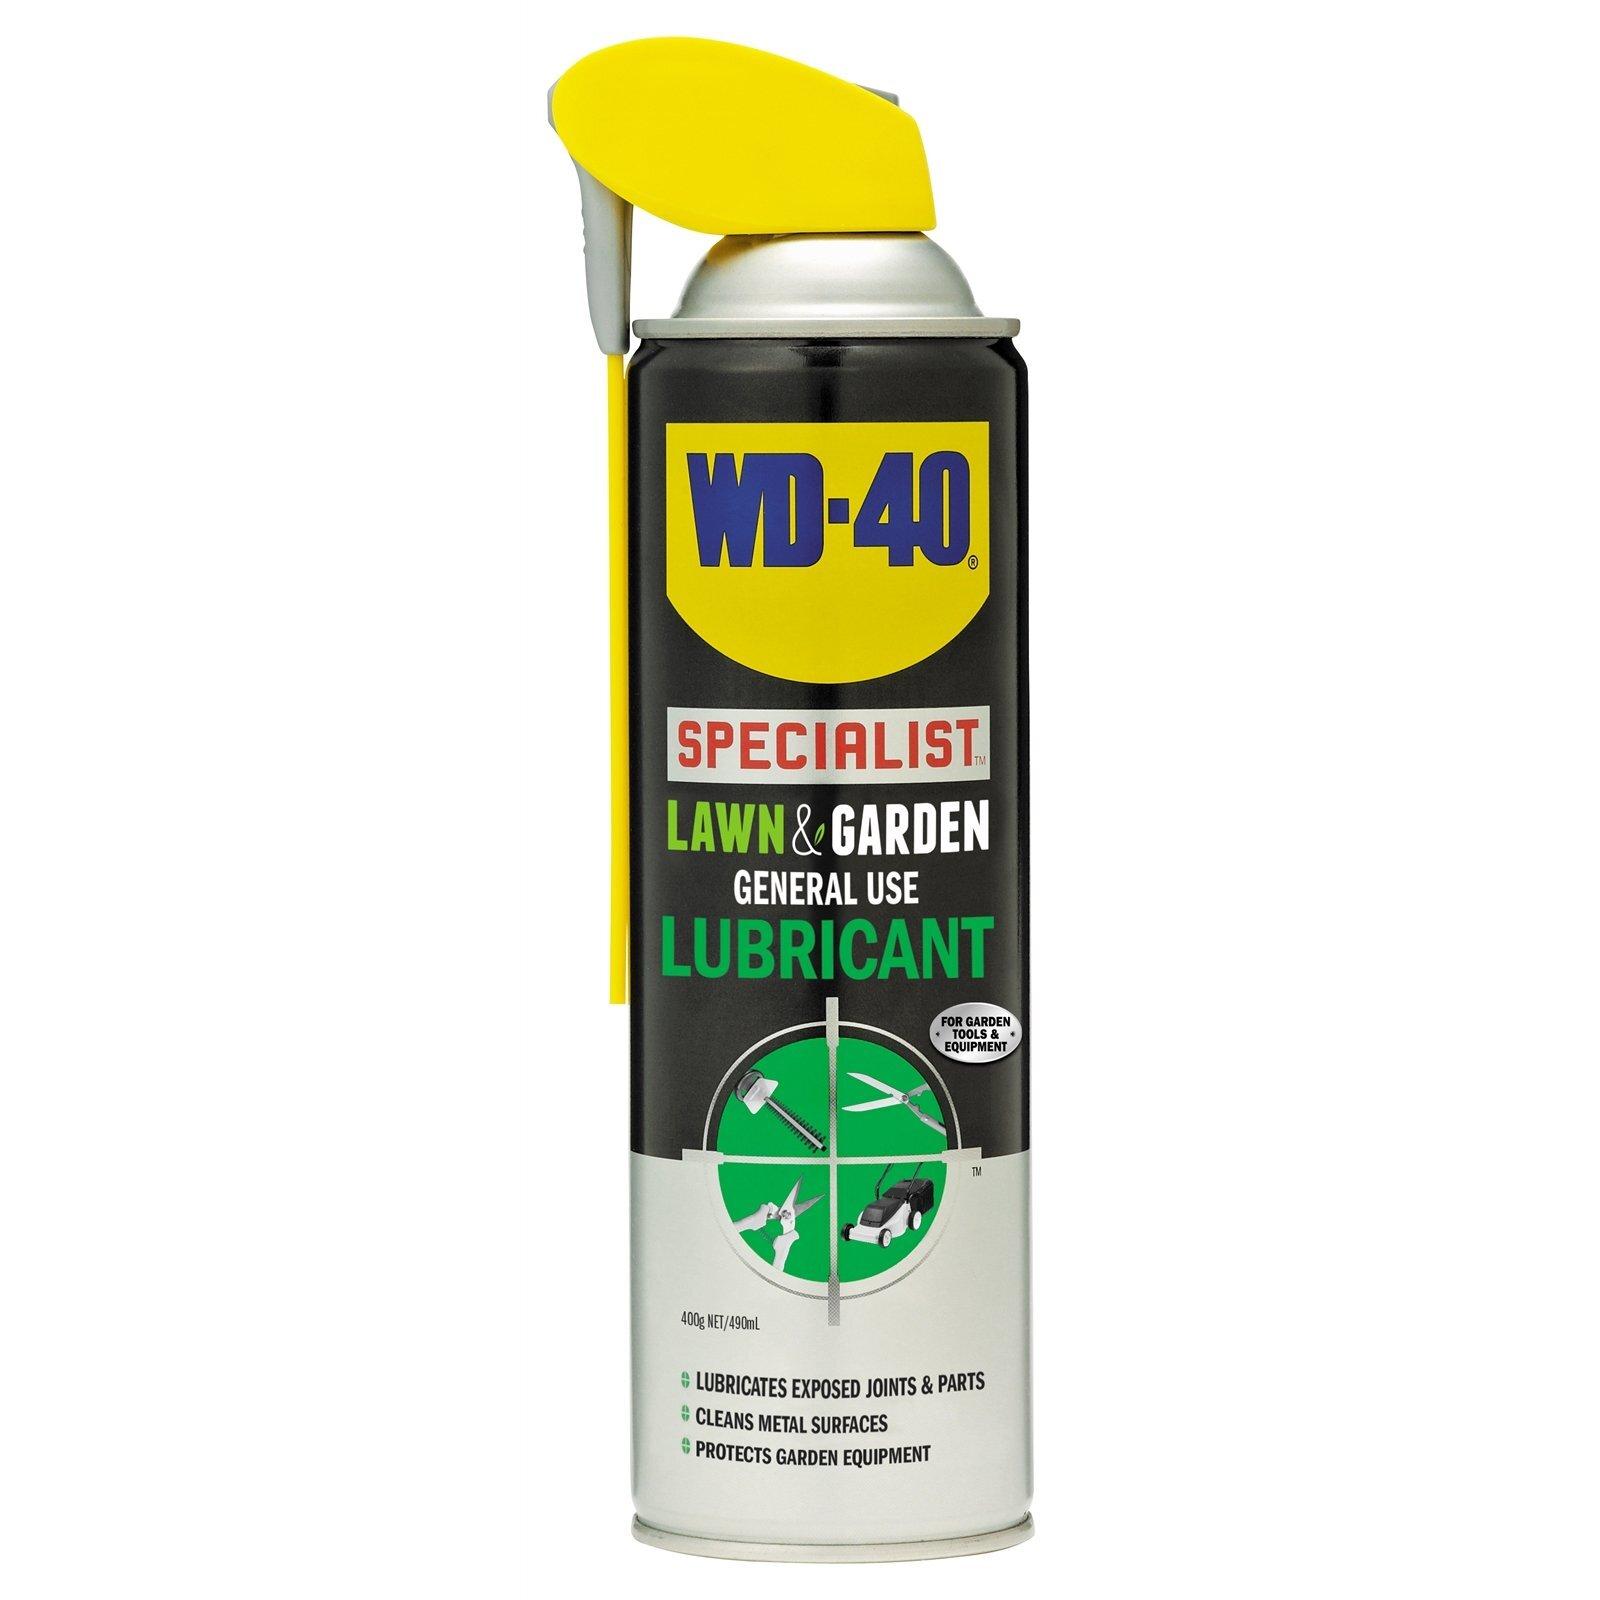 WD-40 Specialist Lawn & Garden Lubricant  490ml